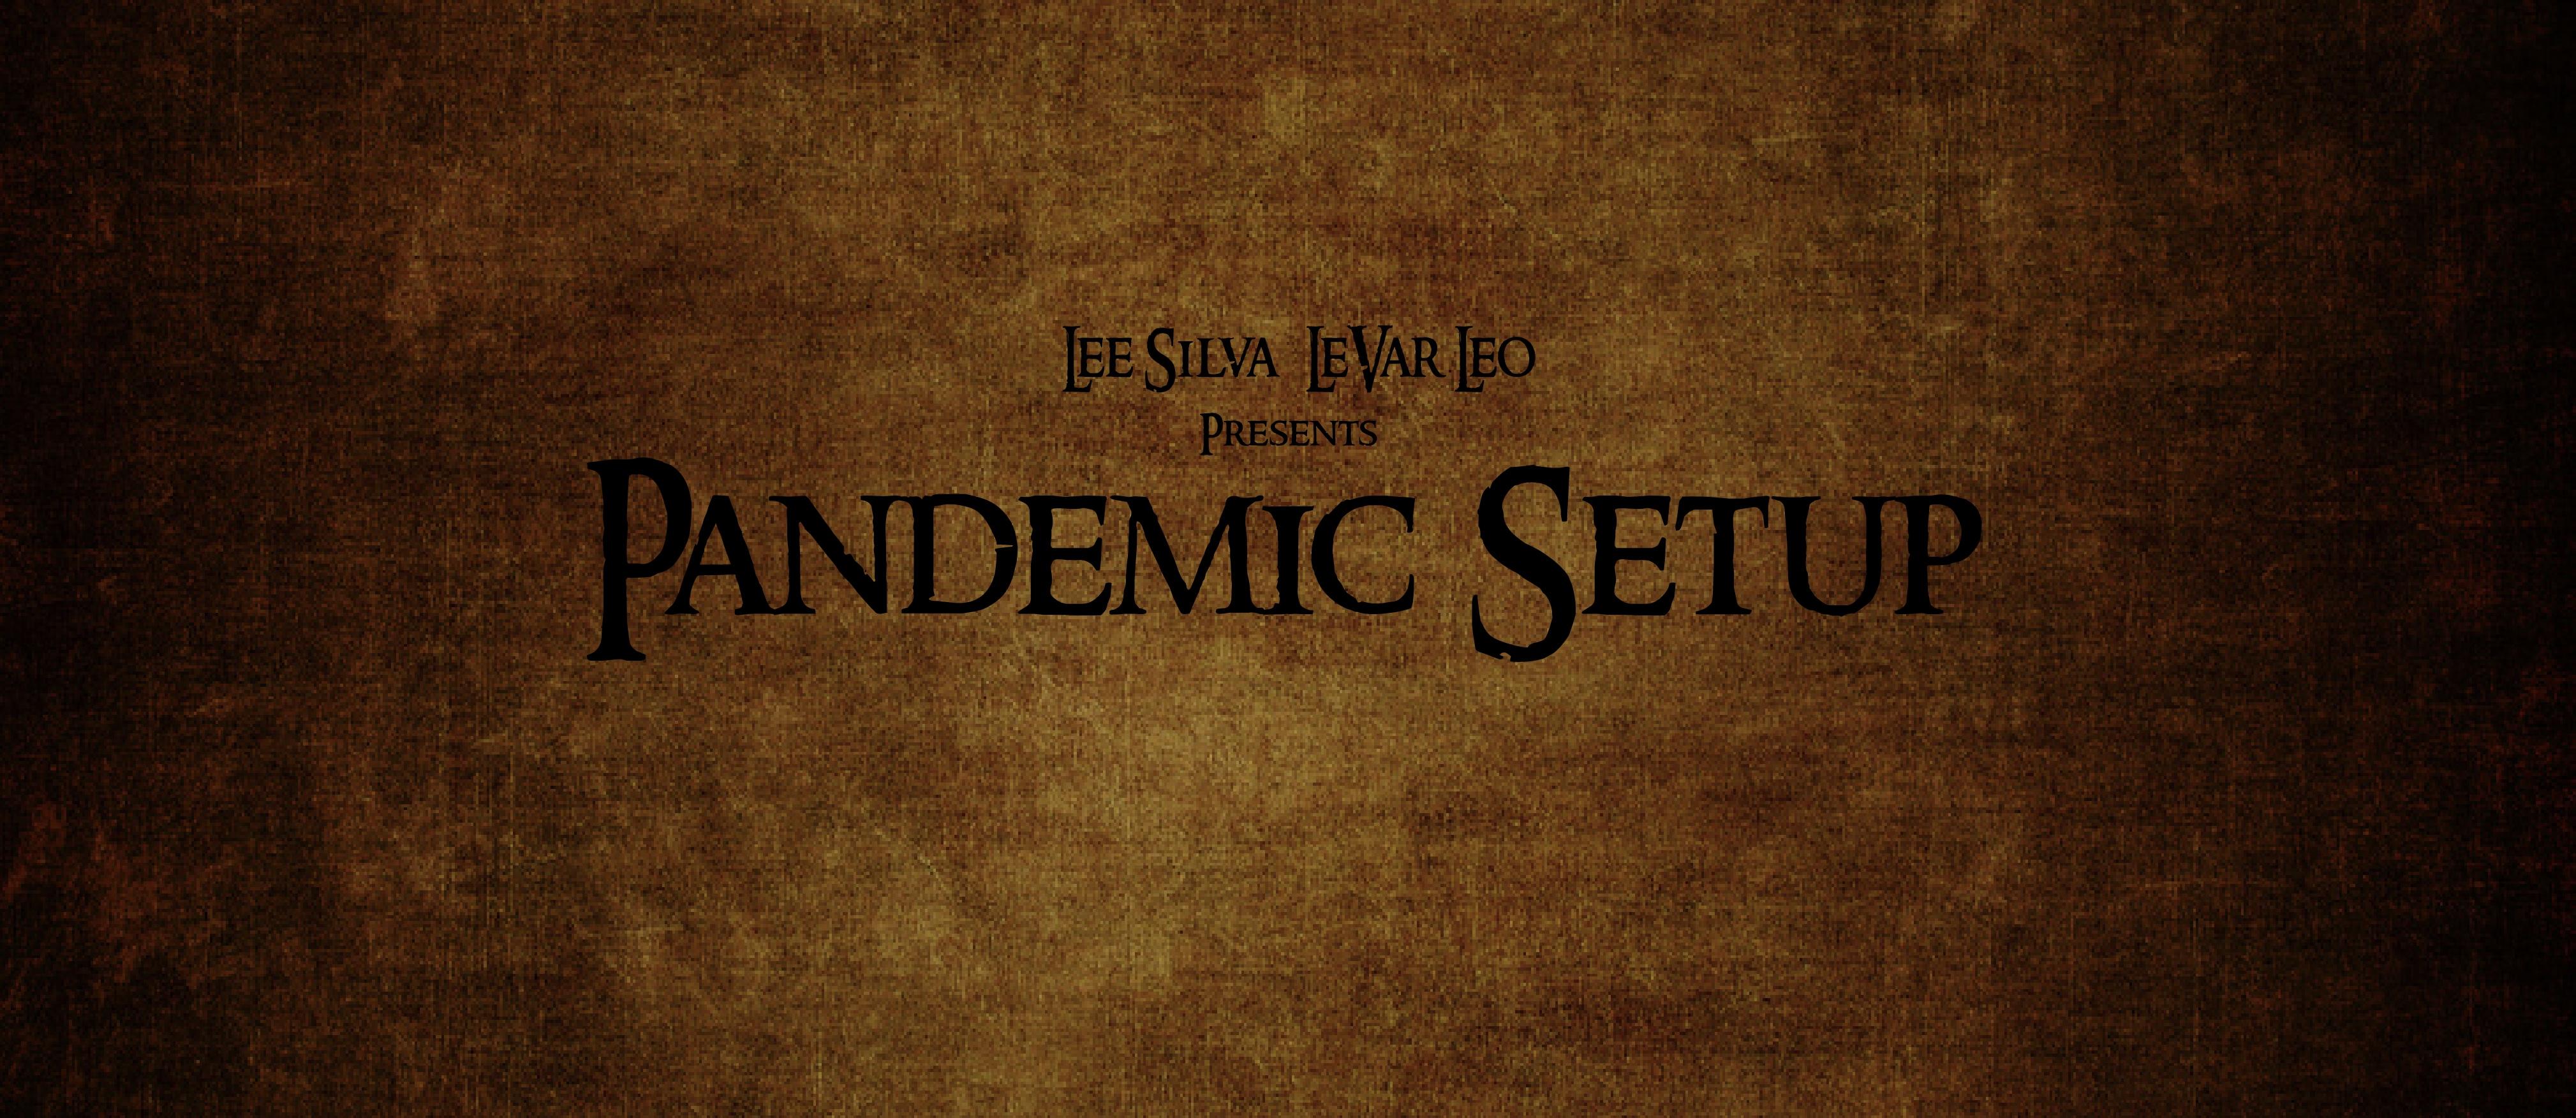 Pandemic Setup (2020)